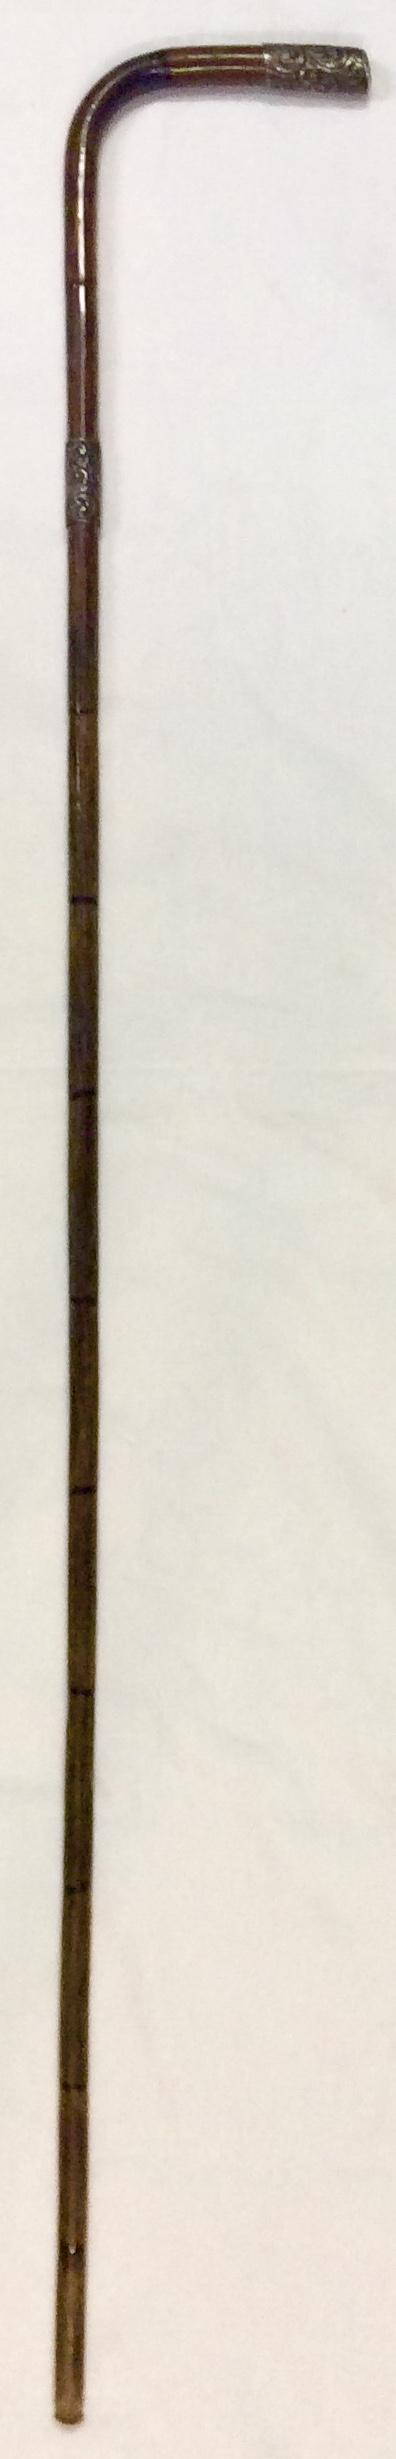 Skinny victorian style walking stick